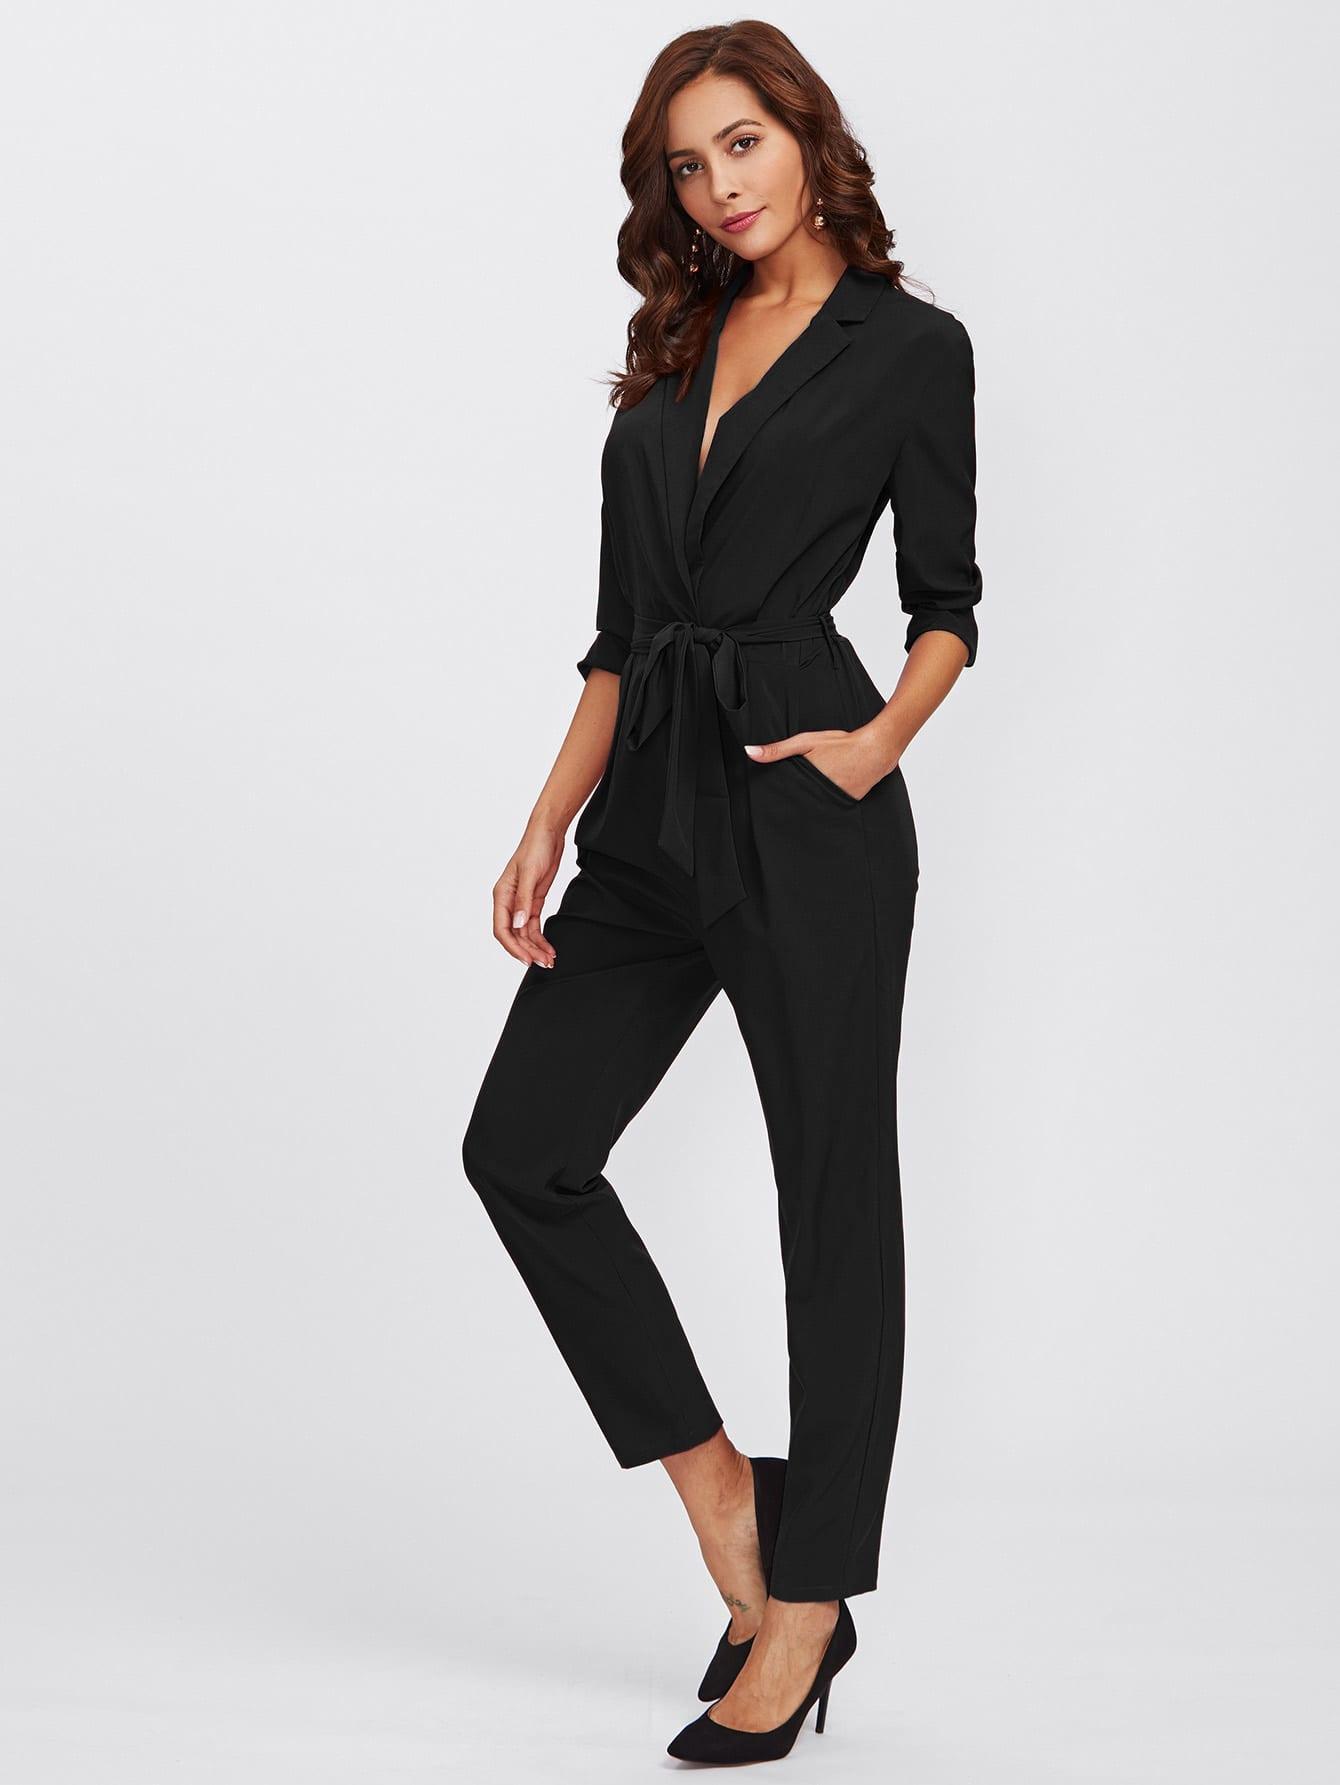 Wrap And Tie Detail Tailored Jumpsuit plaid tailored jumpsuit